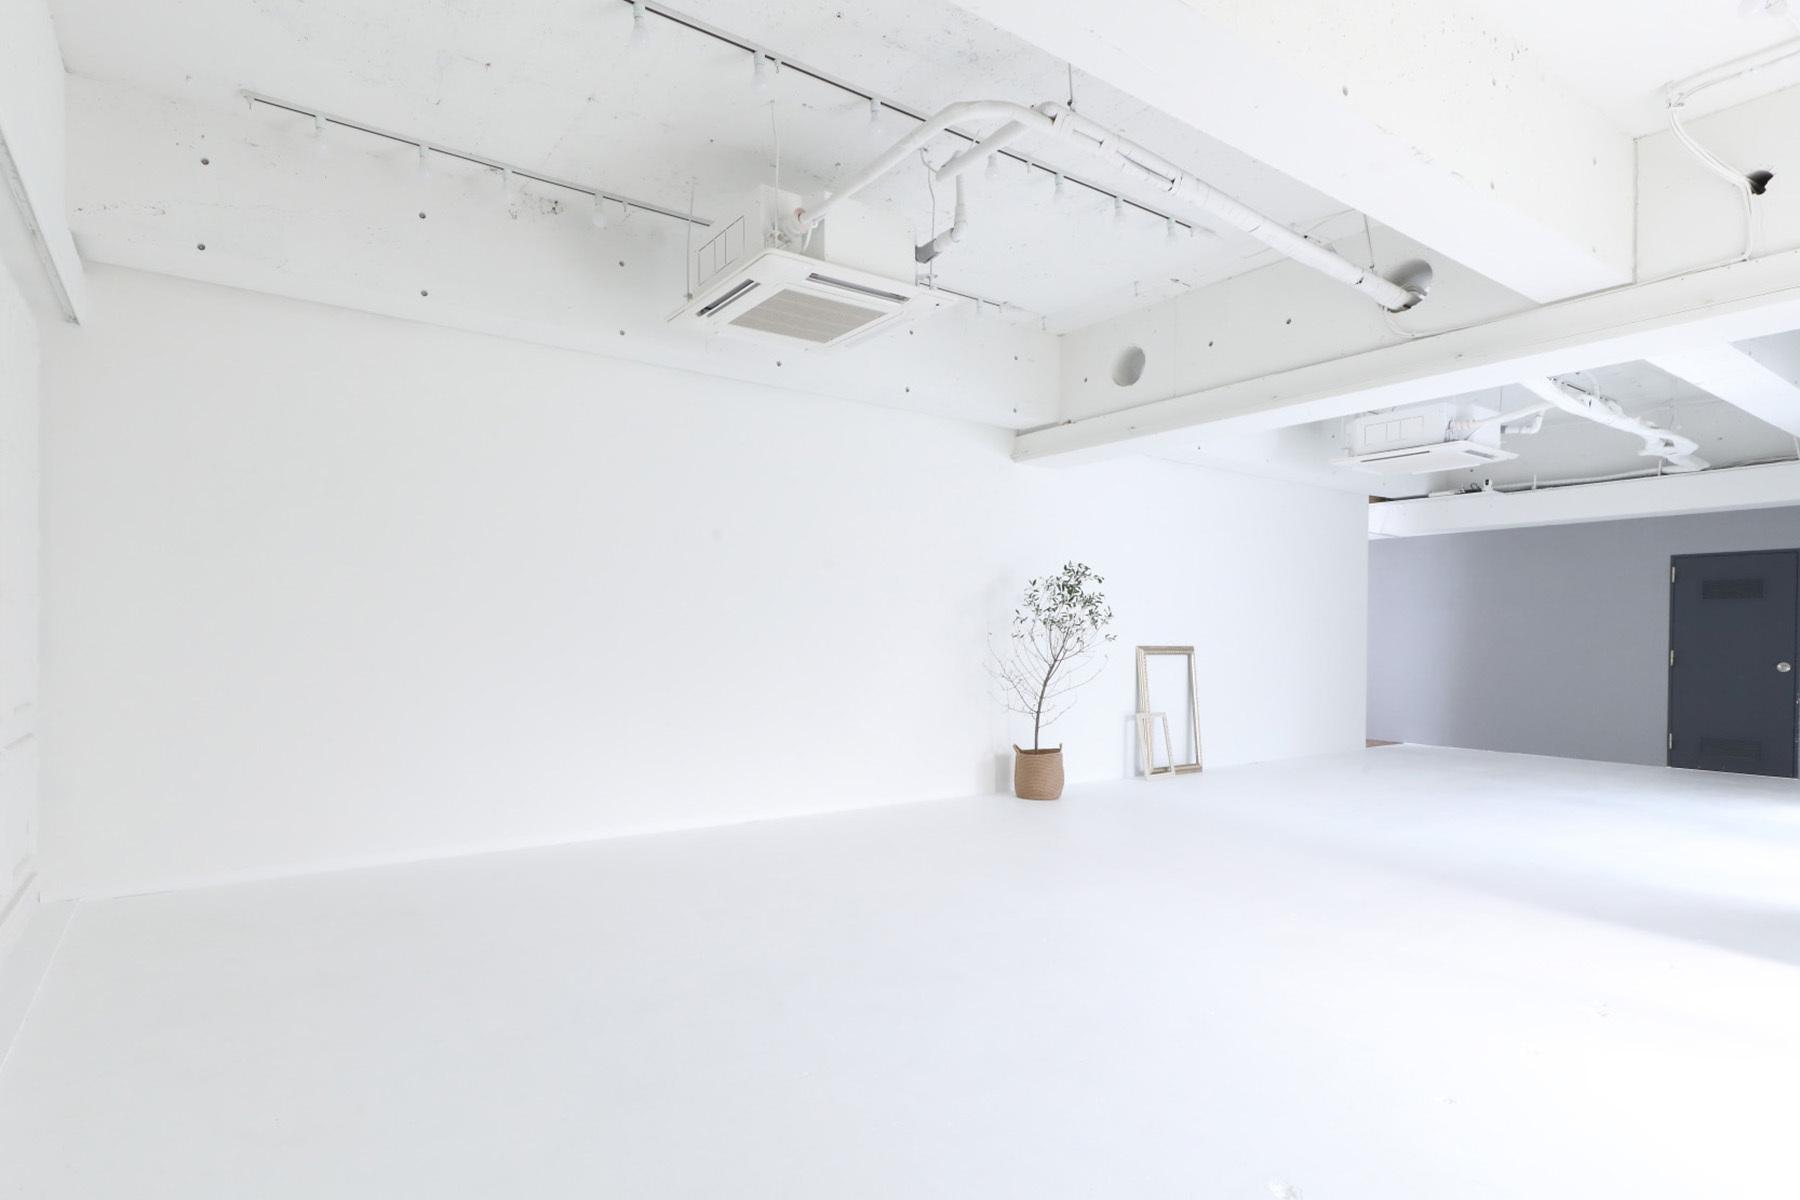 STUDIO FOXTAIL Ast (スタジオ フォックステイル Ast)複数ある全面カーテンで空間演出